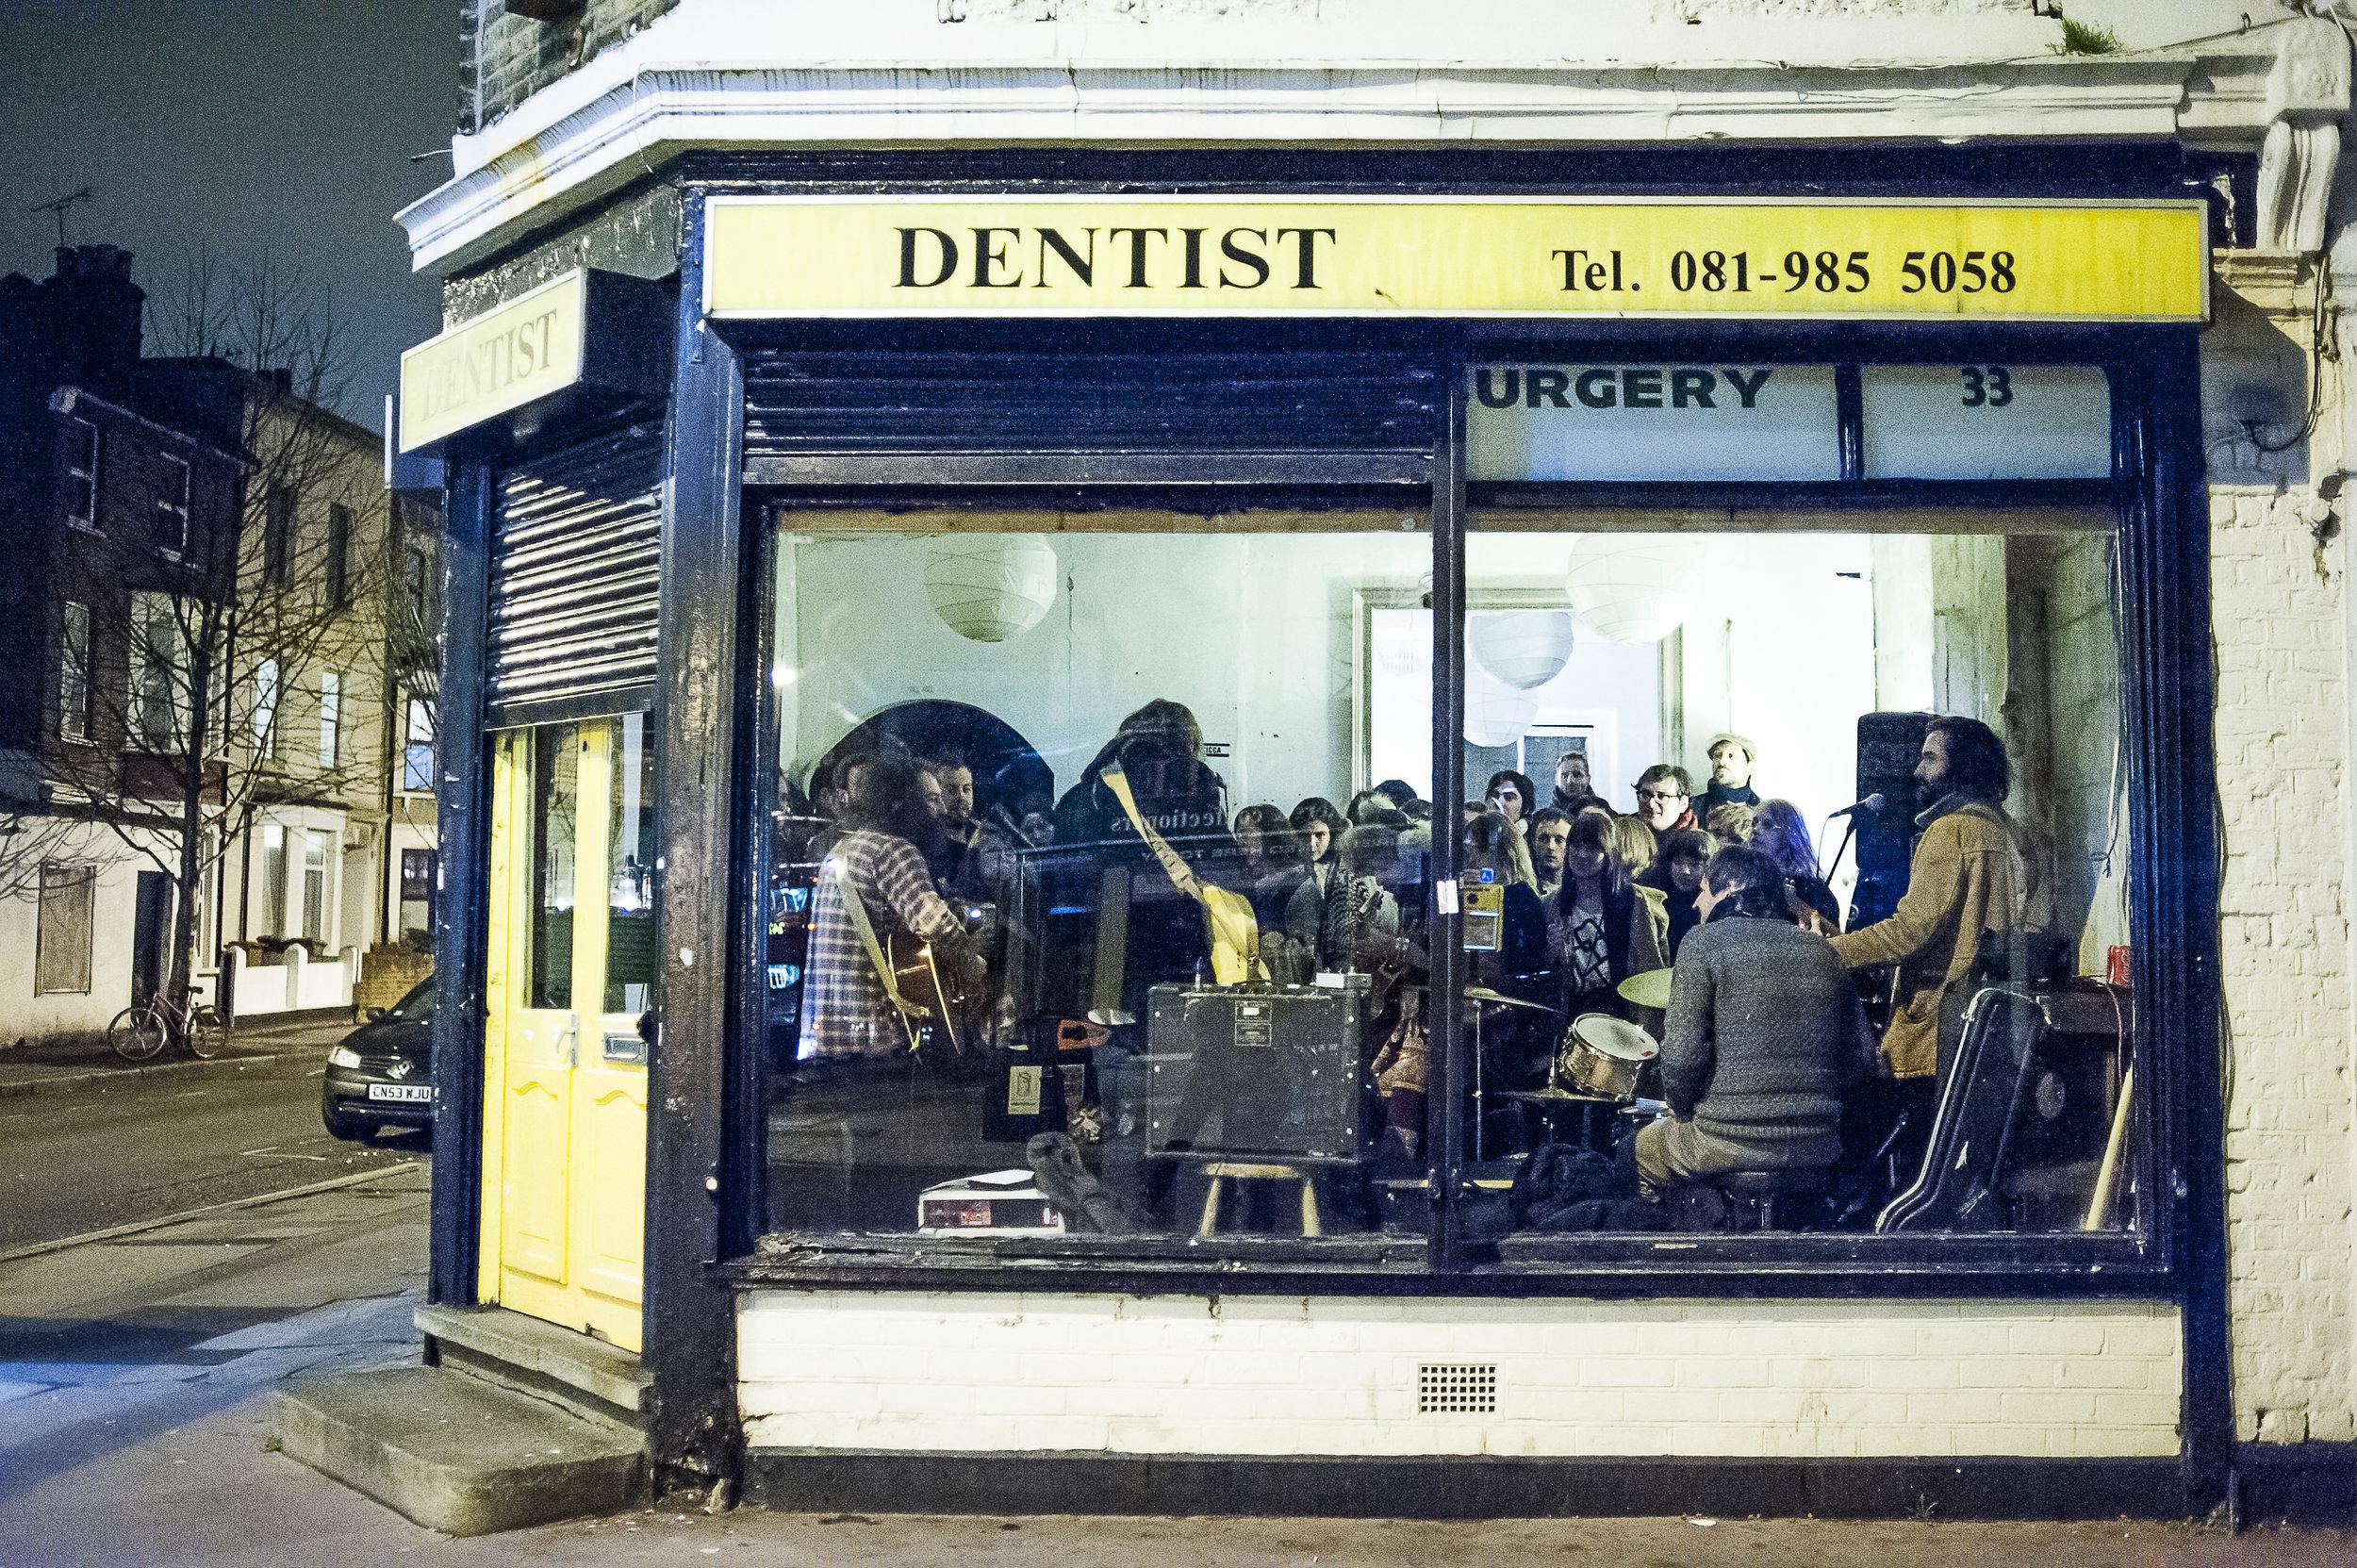 Smokies HR Dentist Window 12.01.13 .jpg